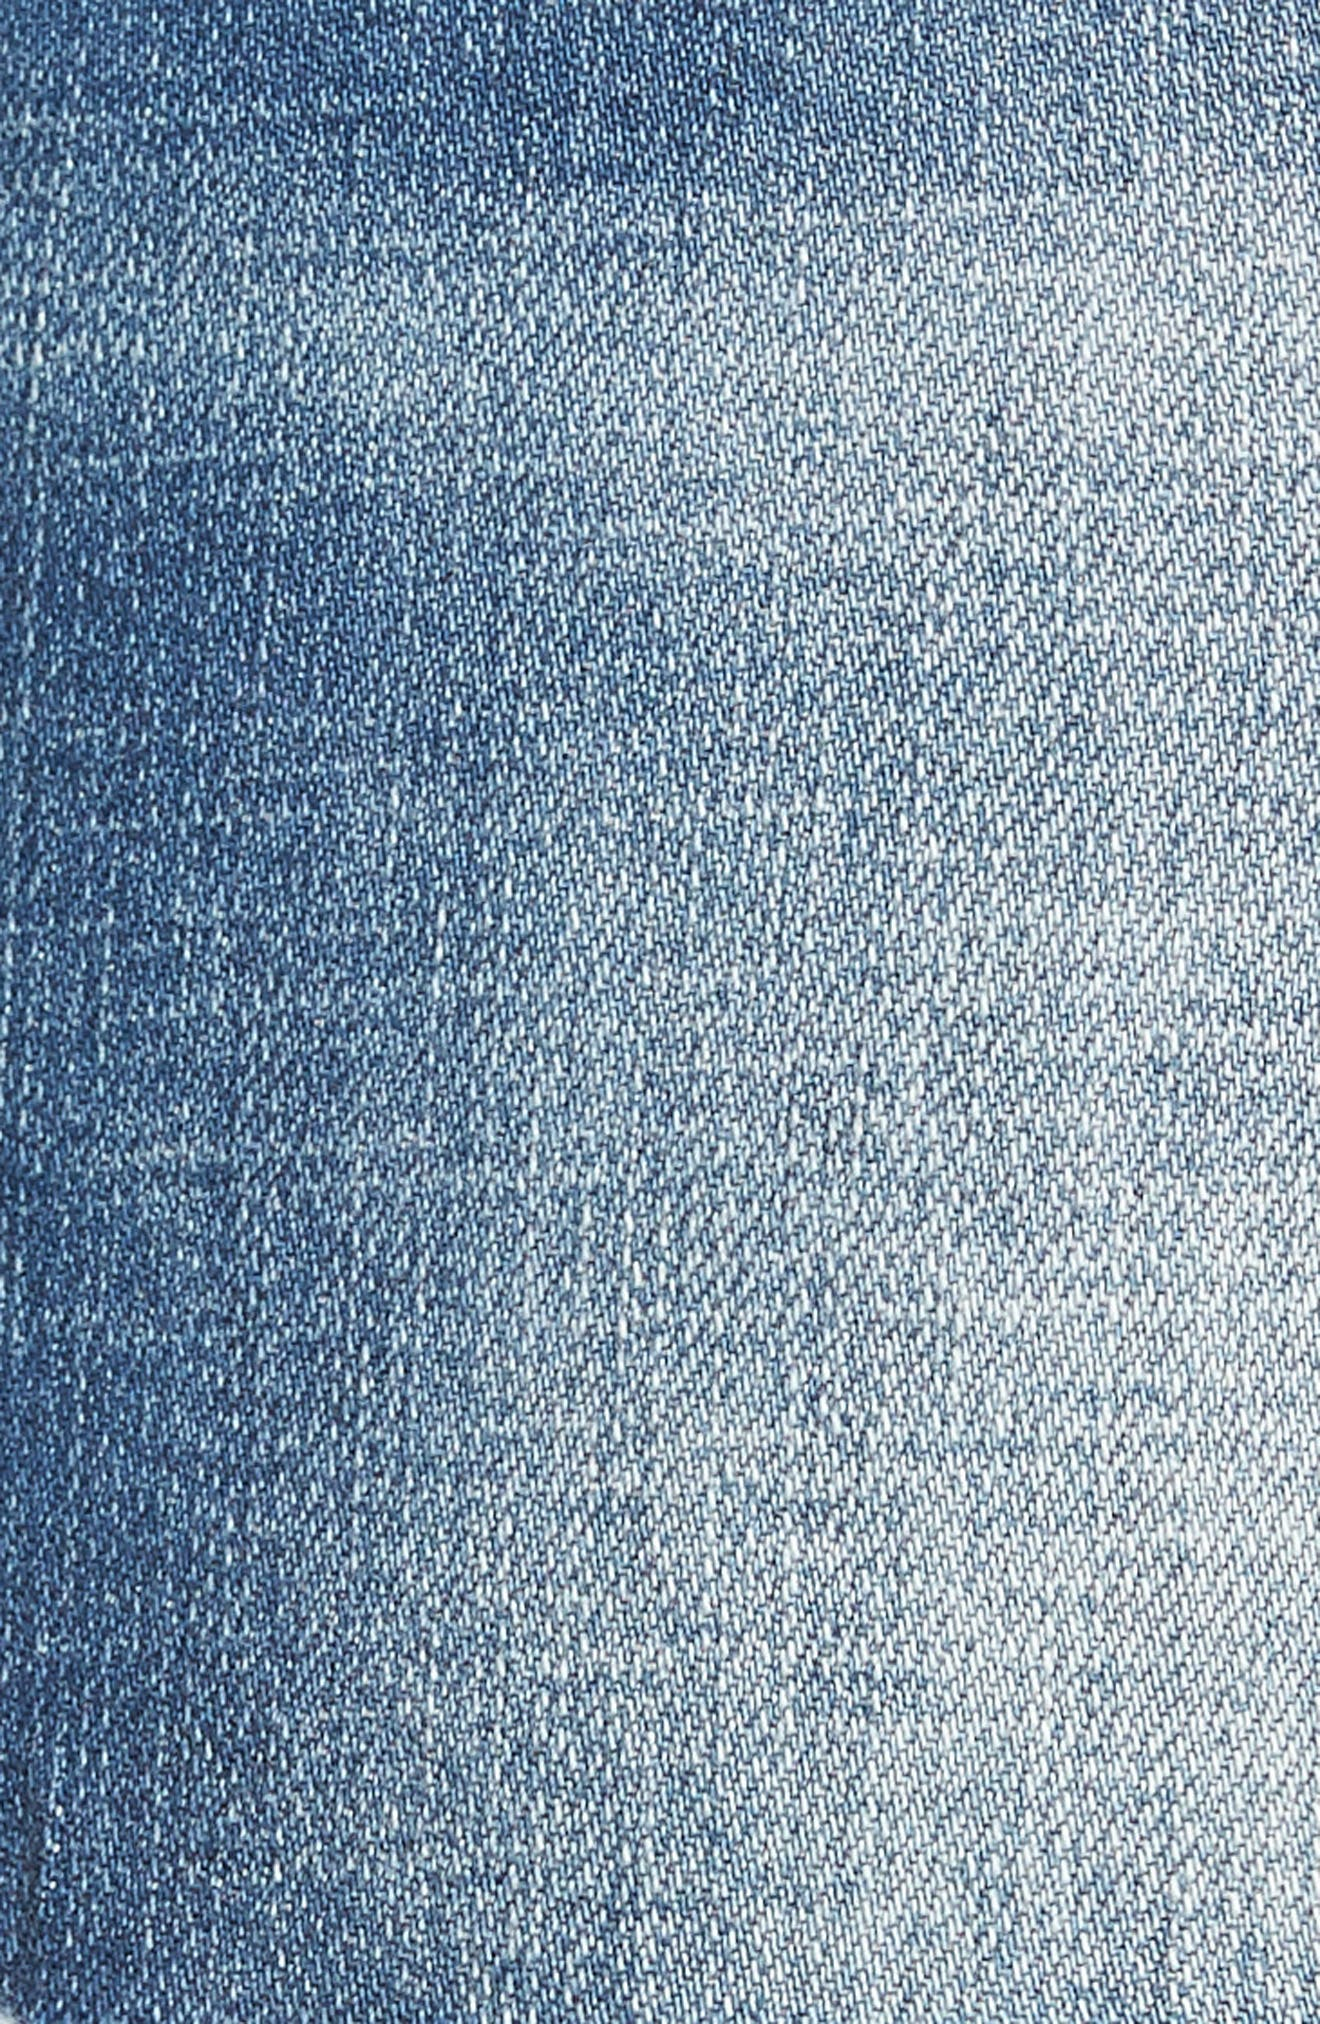 Gidget Distressed Denim Shorts,                             Alternate thumbnail 6, color,                             475